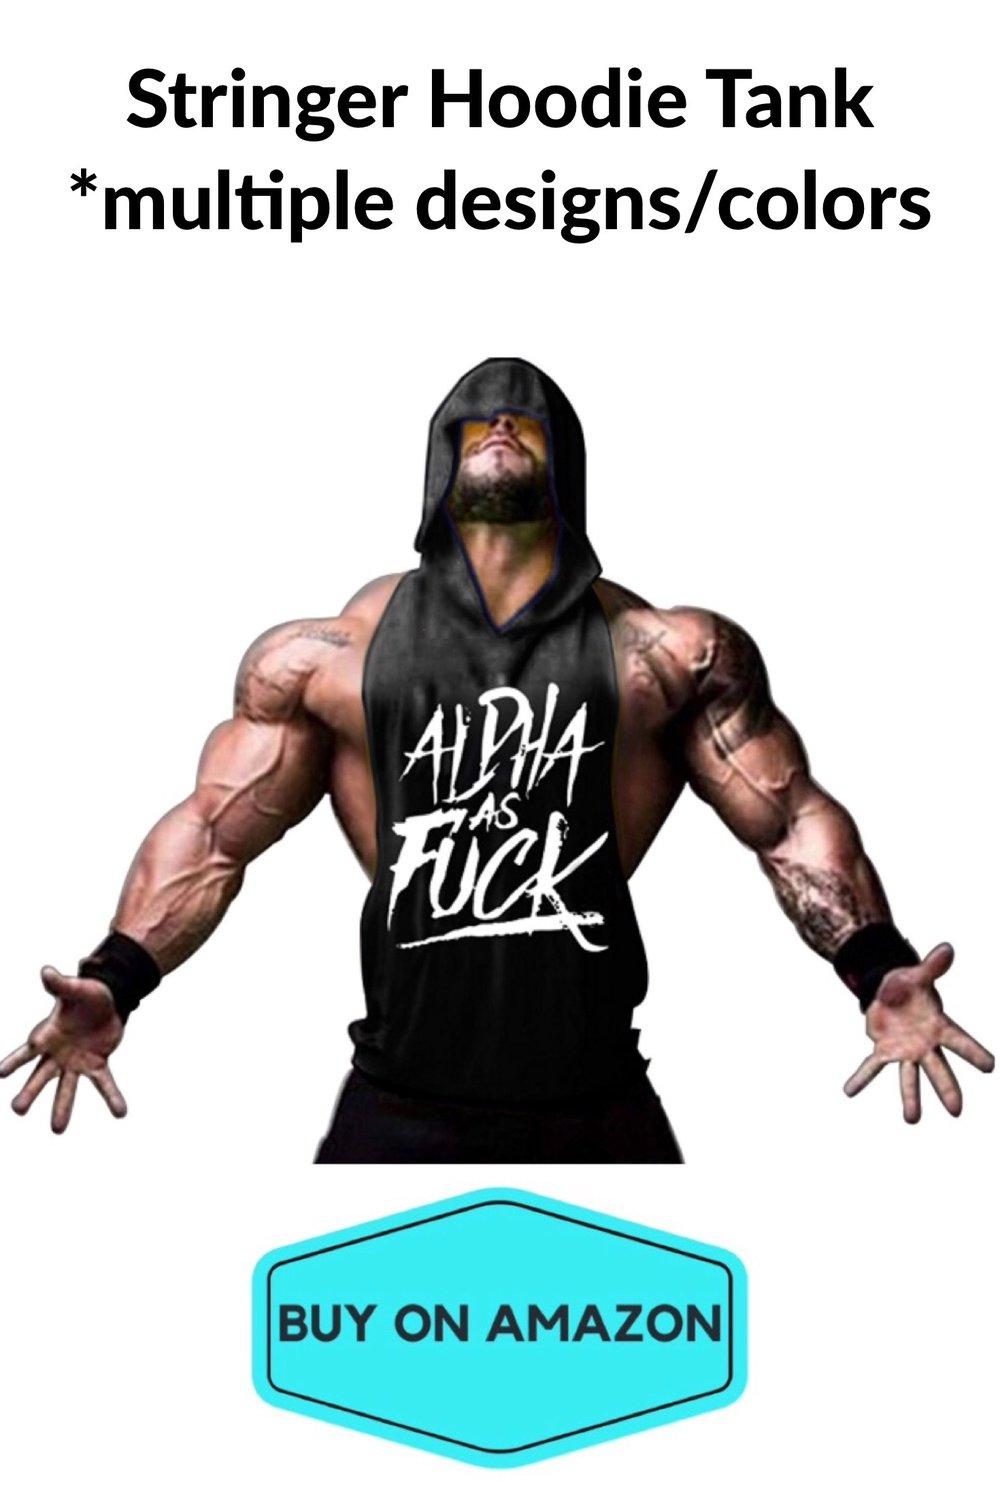 Men's Stringer Hoodie Gym Tank